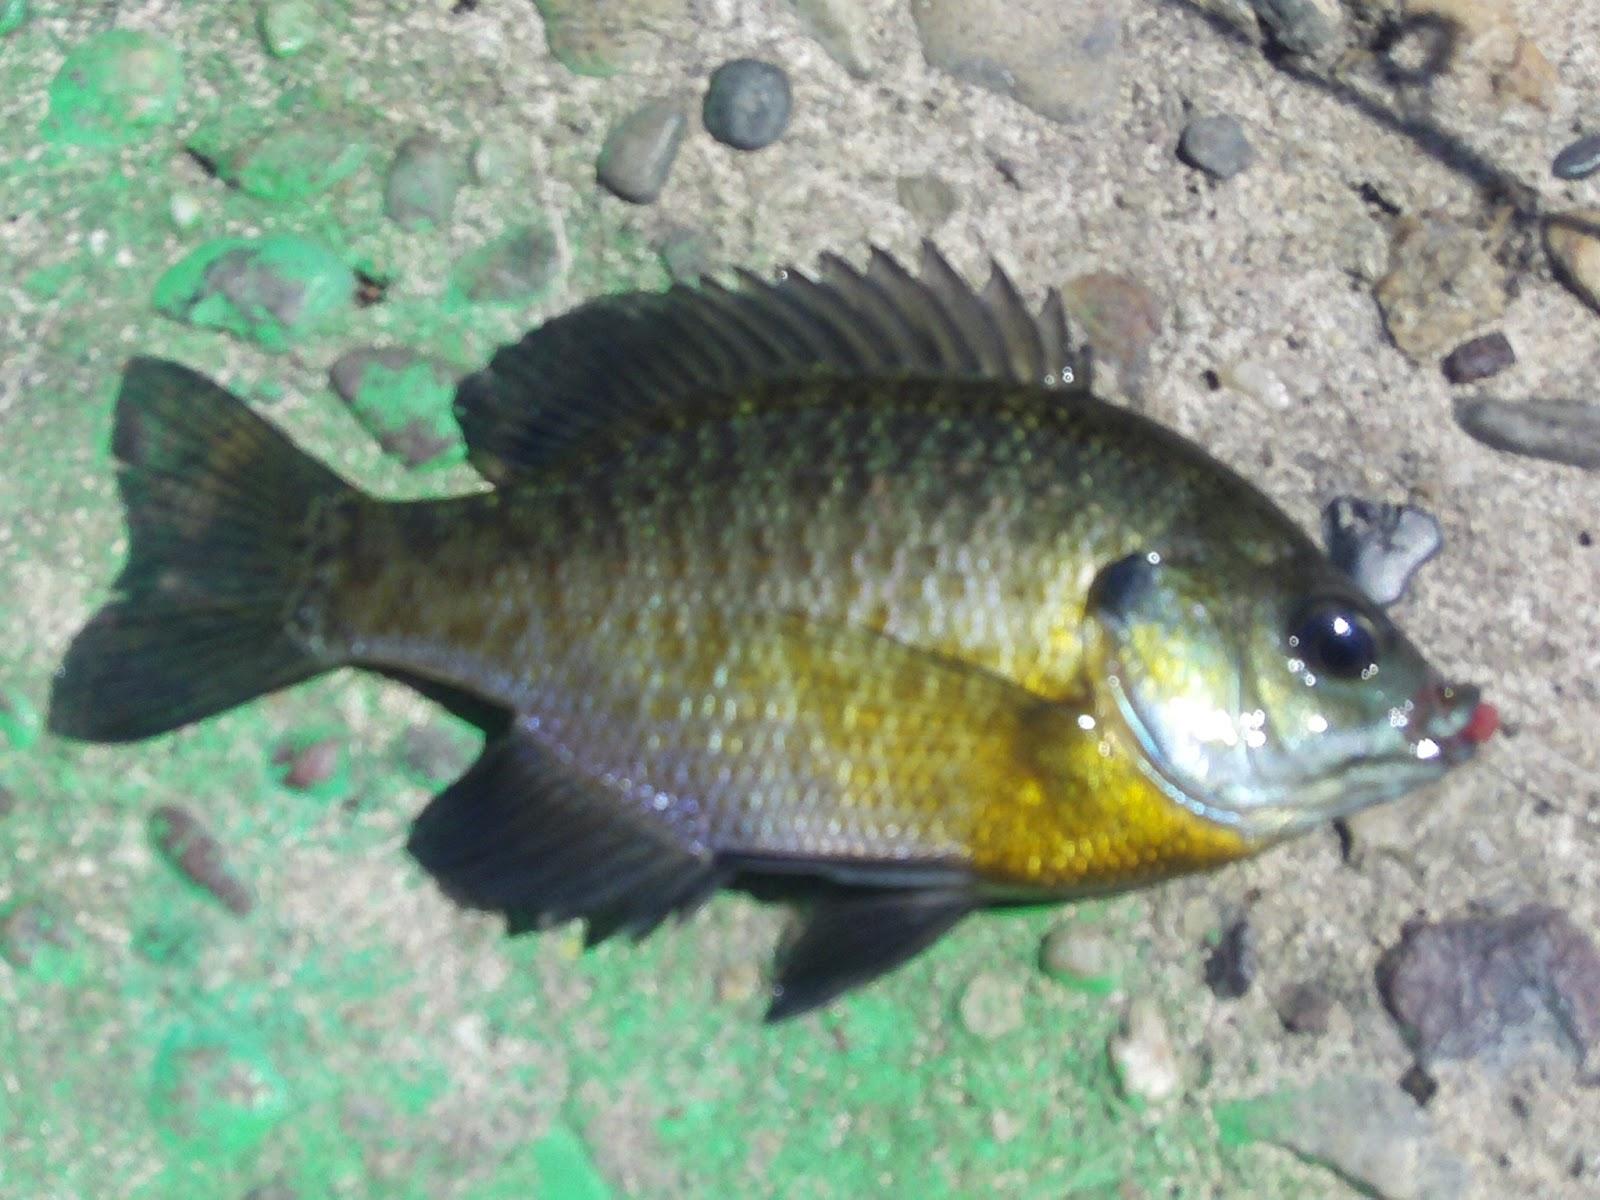 Fishing in philadelphia first time fishing krikwood lake nj for Little fish philadelphia